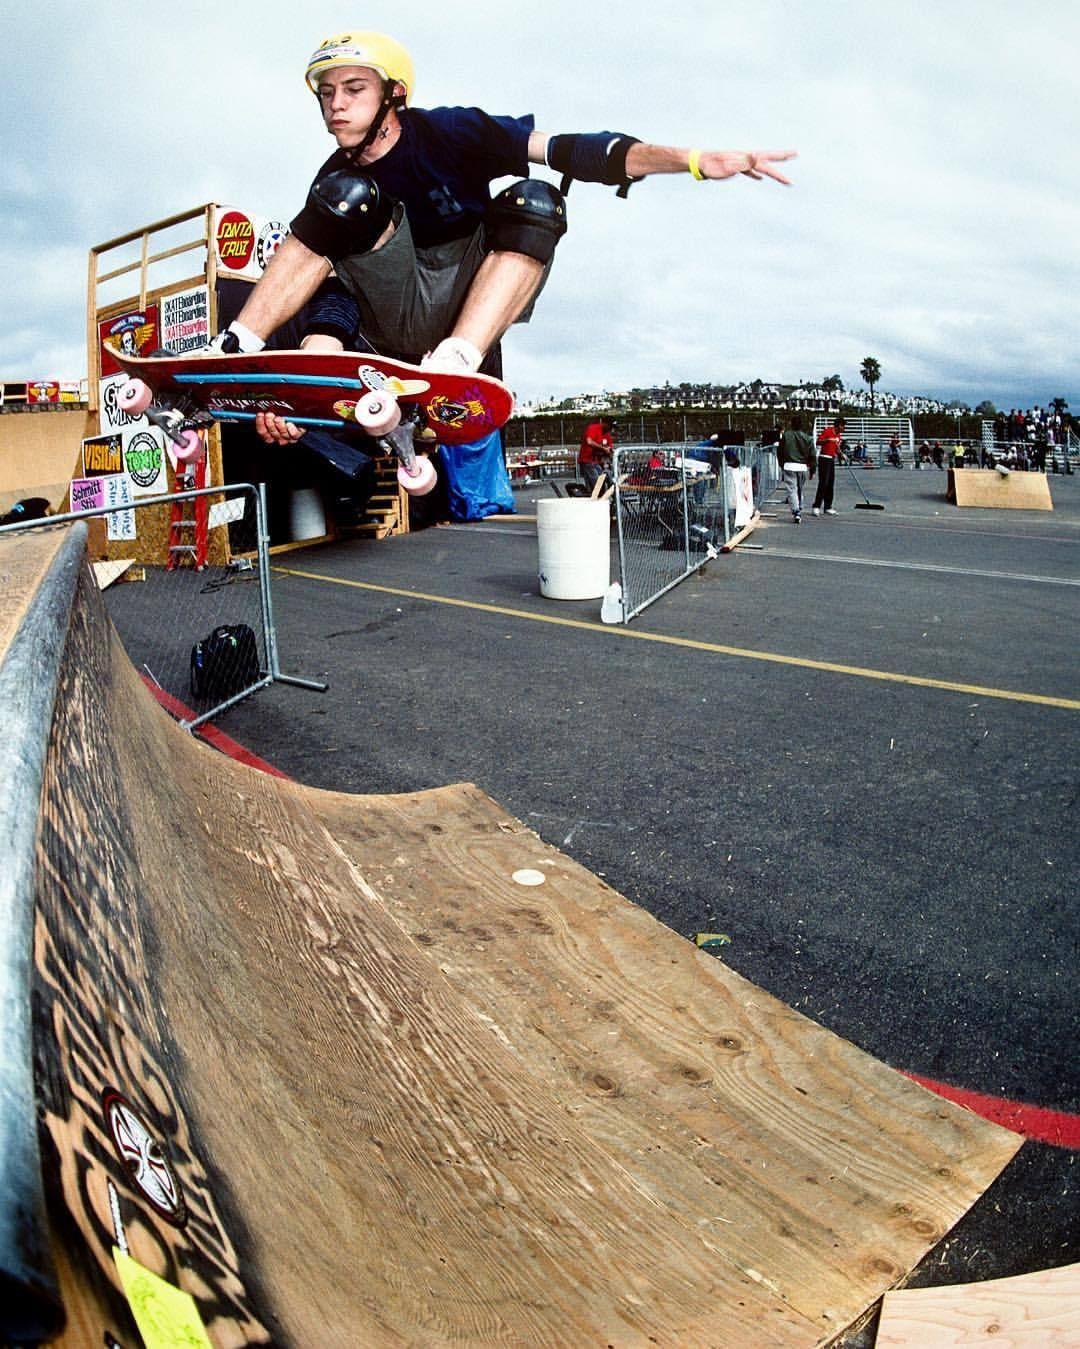 Punk Rock Skateboarding Jgrantbrittain Steviecab Jumps Over His Del Mar Fairgrounds Skateboard Del Mar